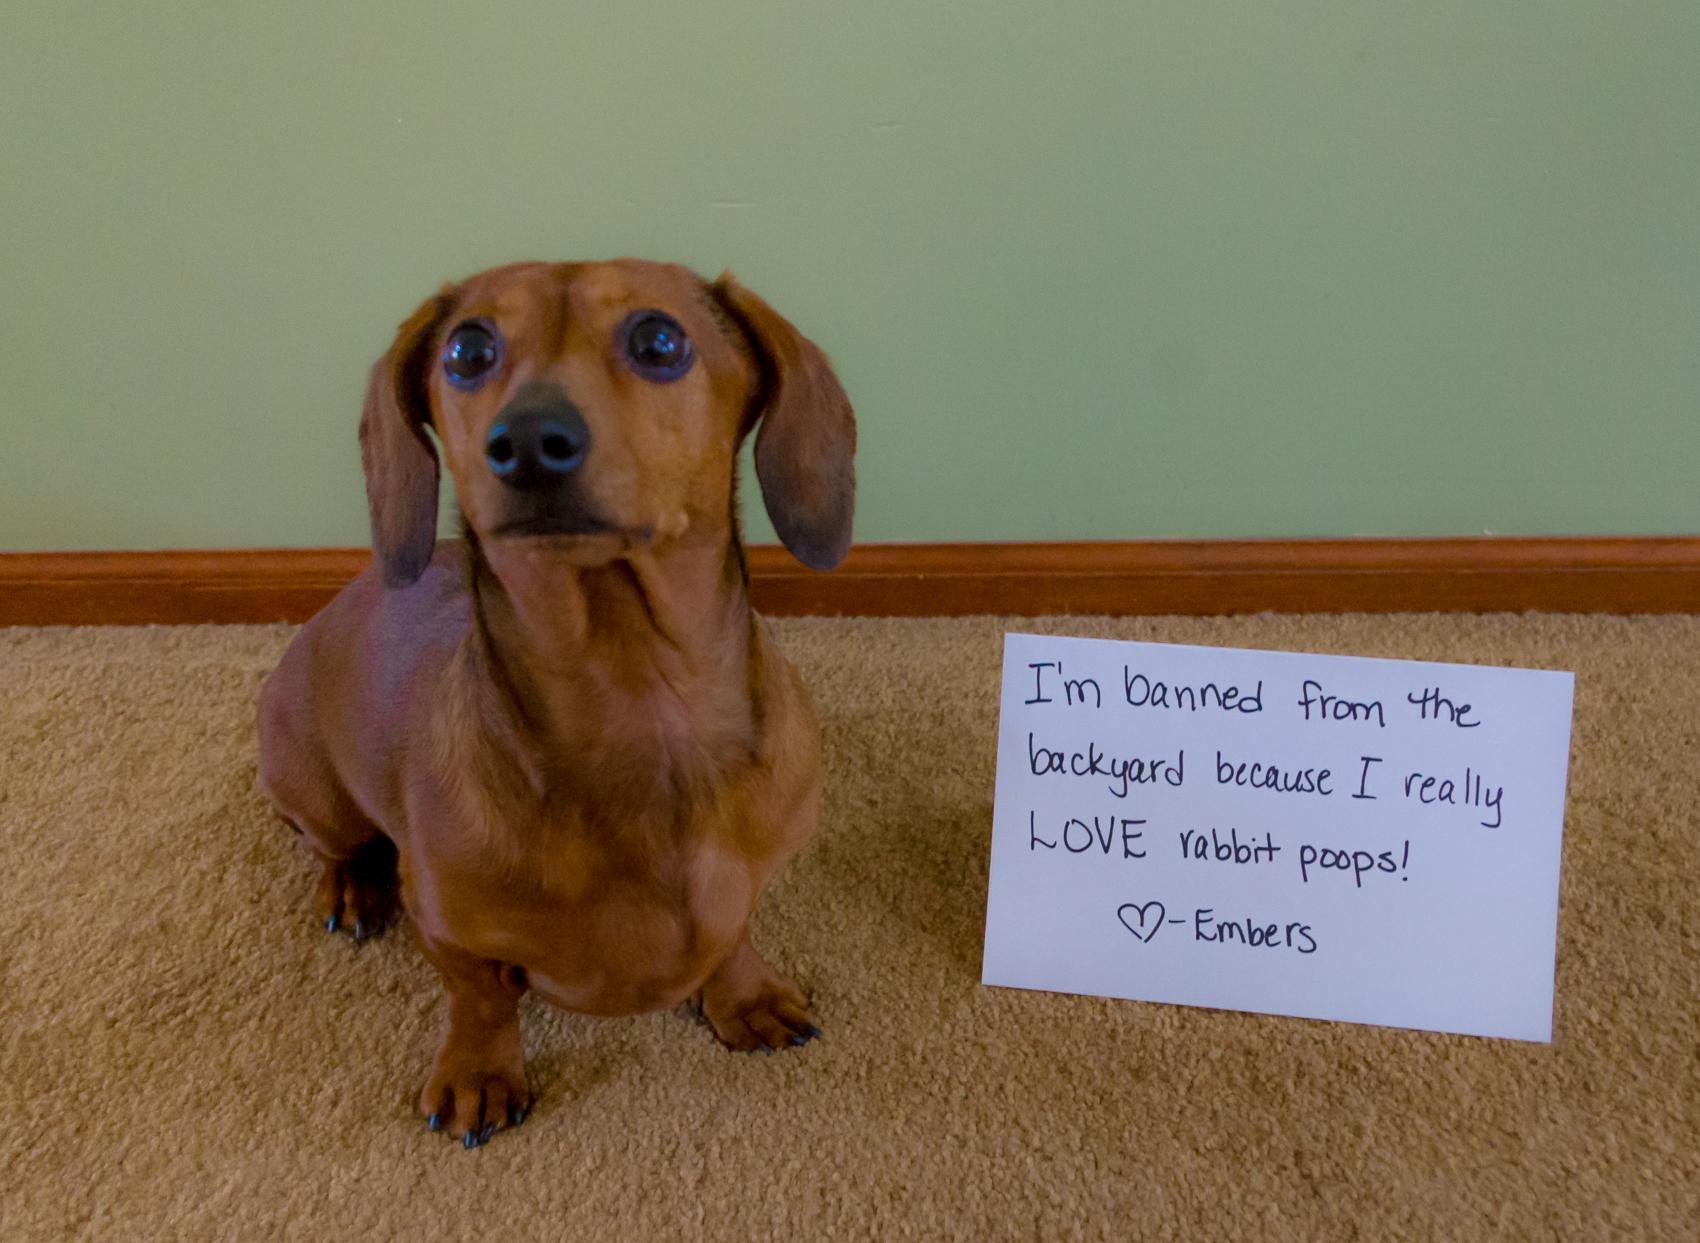 Dog Poop Backyard - audidatlevante.com